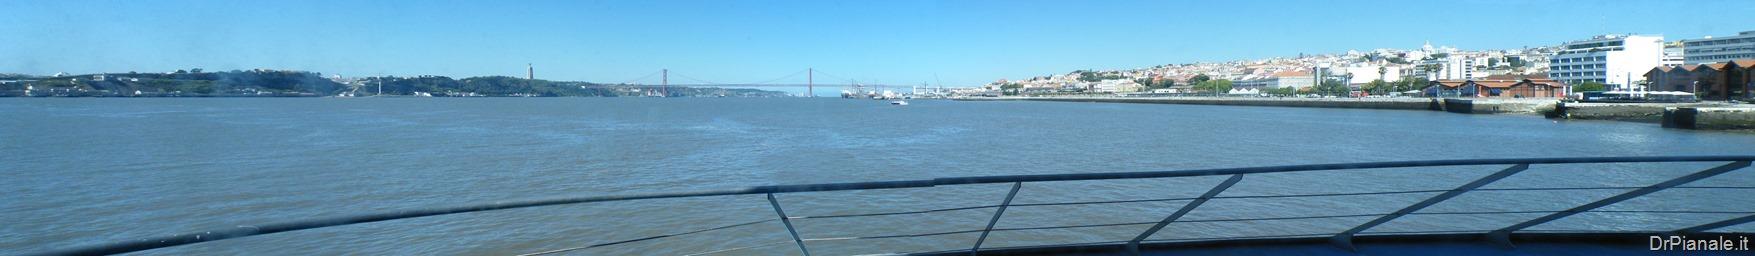 2013_0724_Lisbona_1223